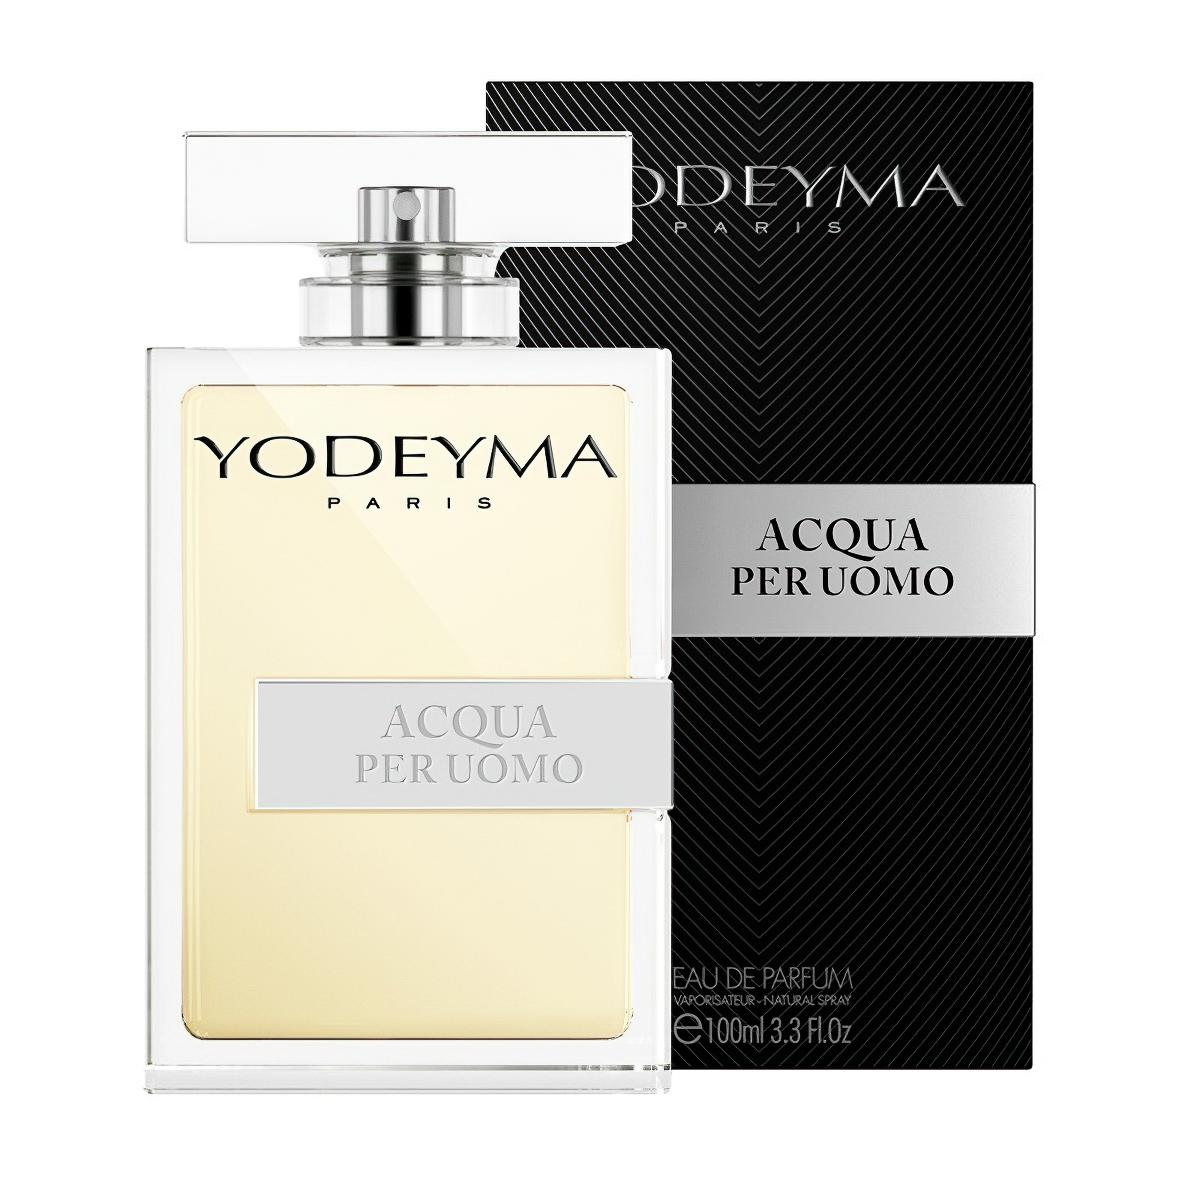 Pánský parfém ACQUA PER UOMO Eau de Parfum, chyprová - svěží, 100ml